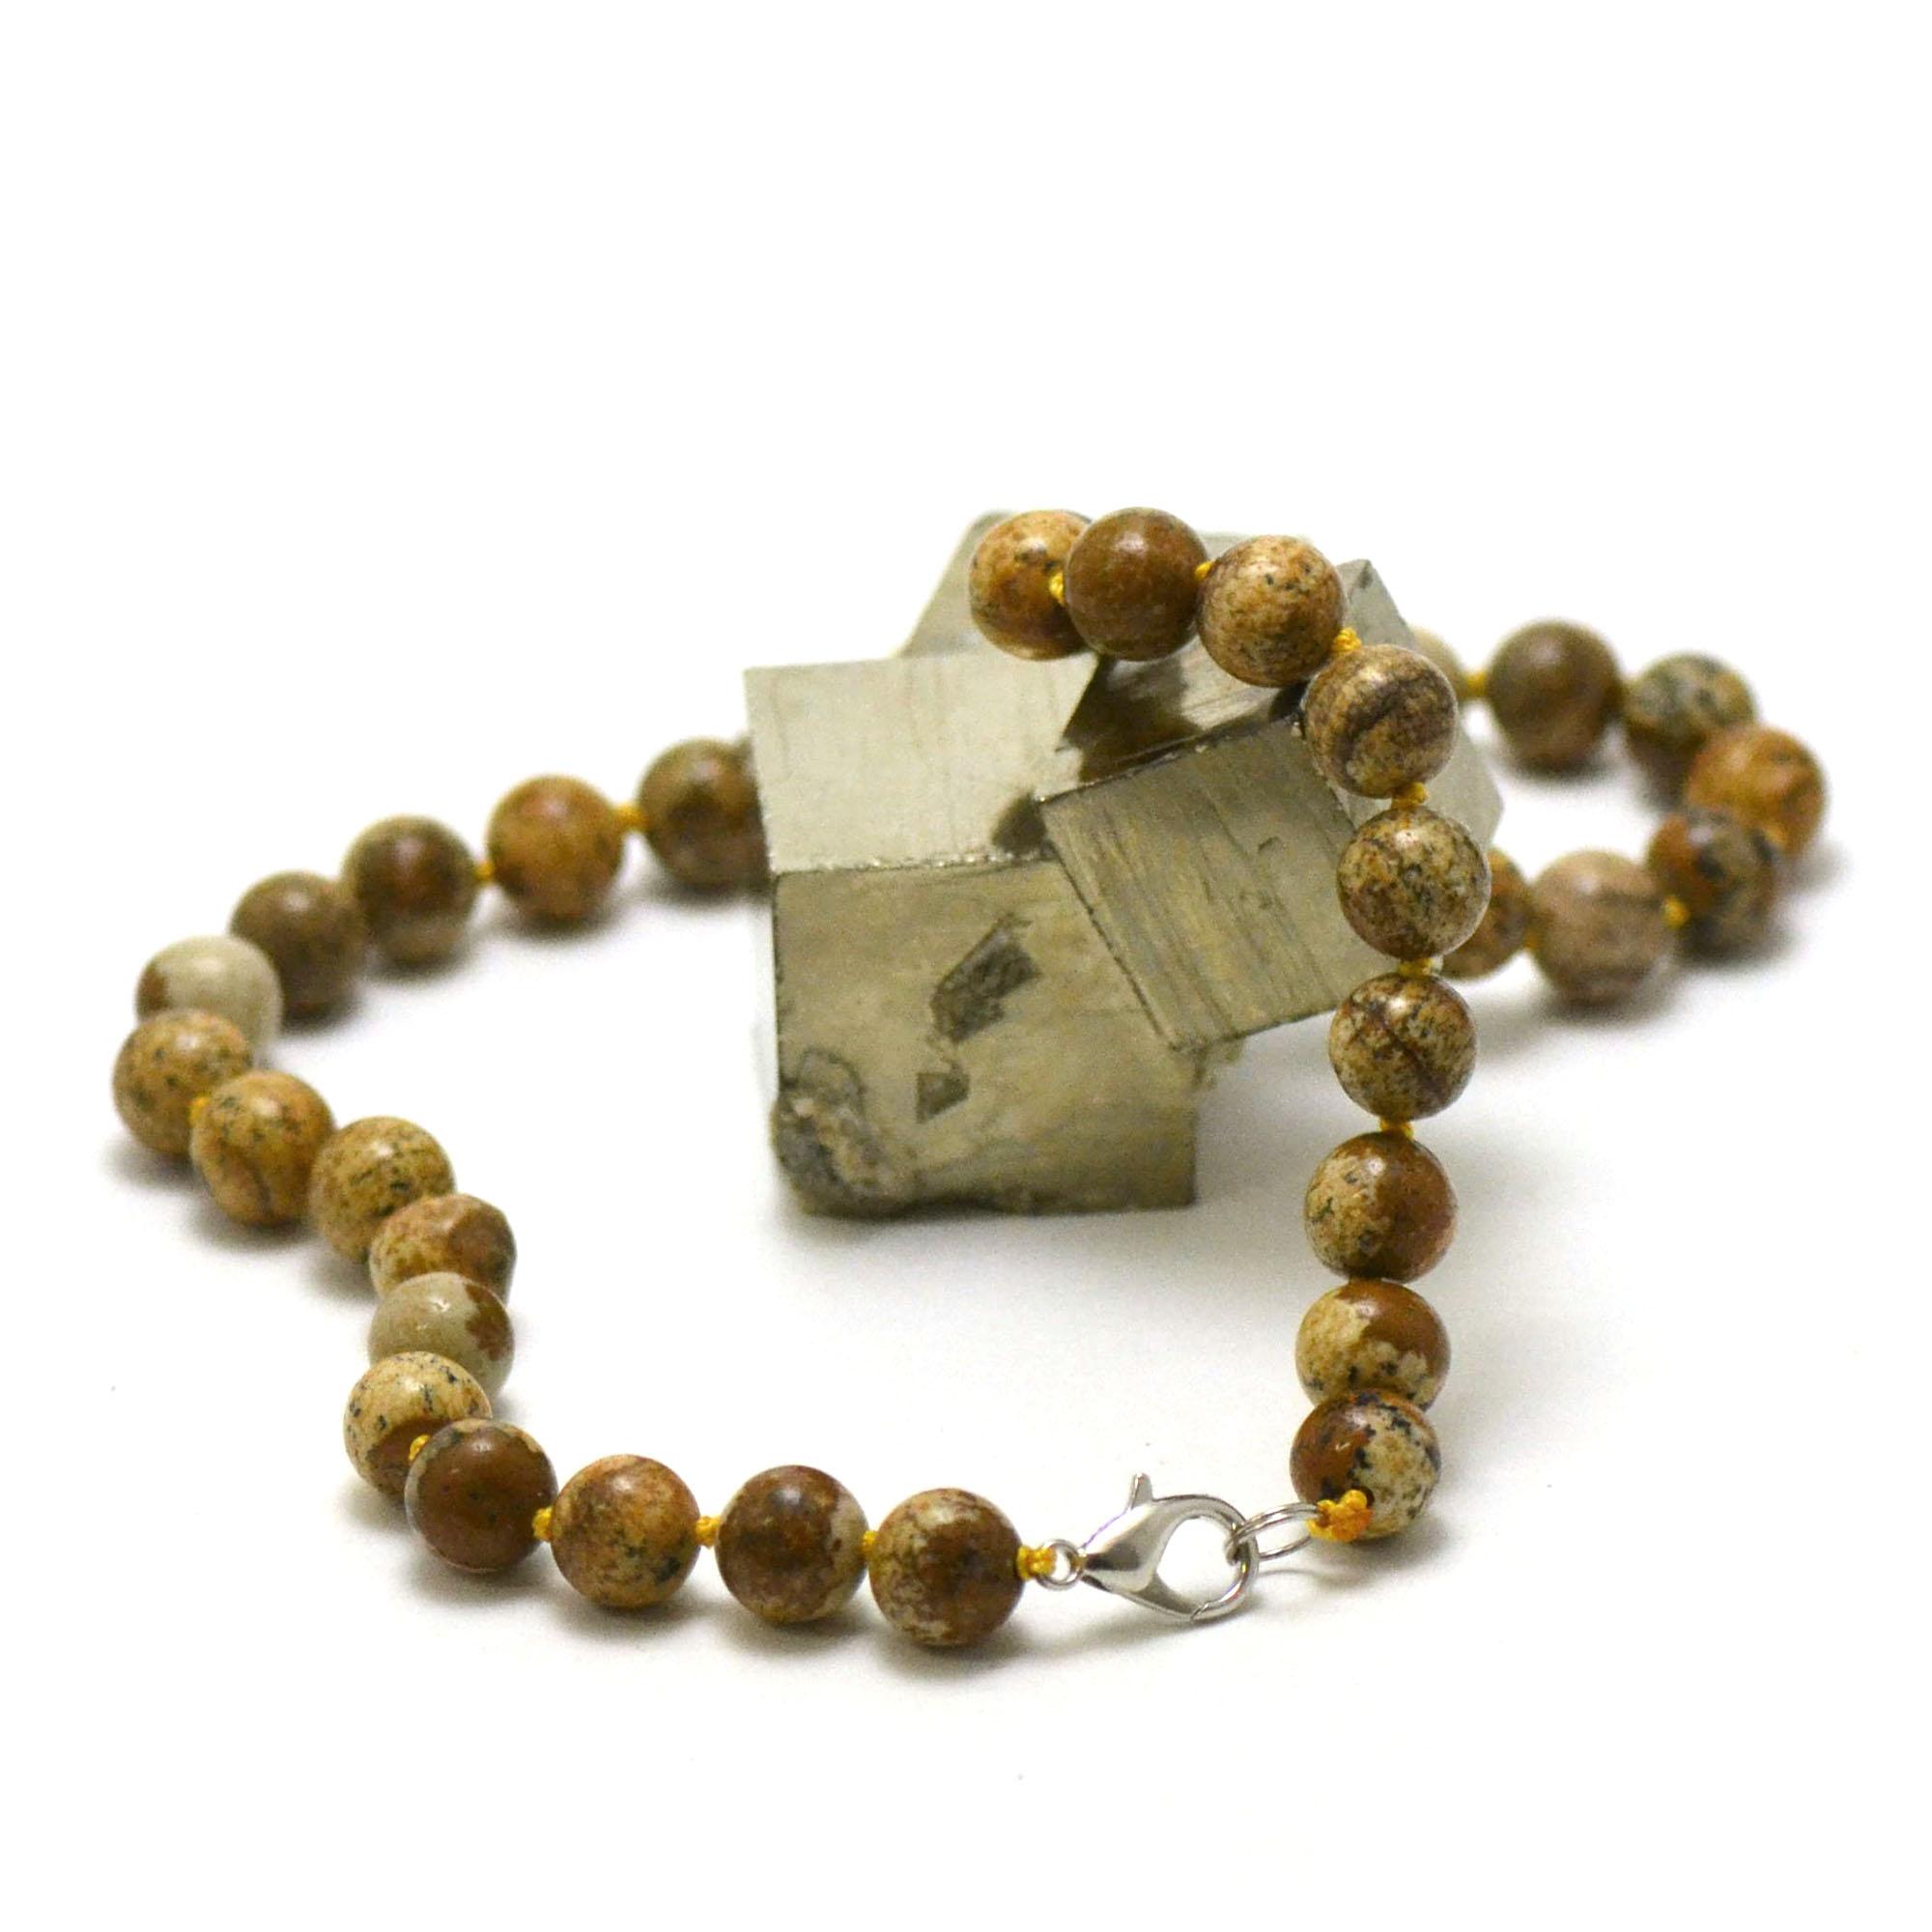 collier en jaspe paysage, perle ronde 10 mm